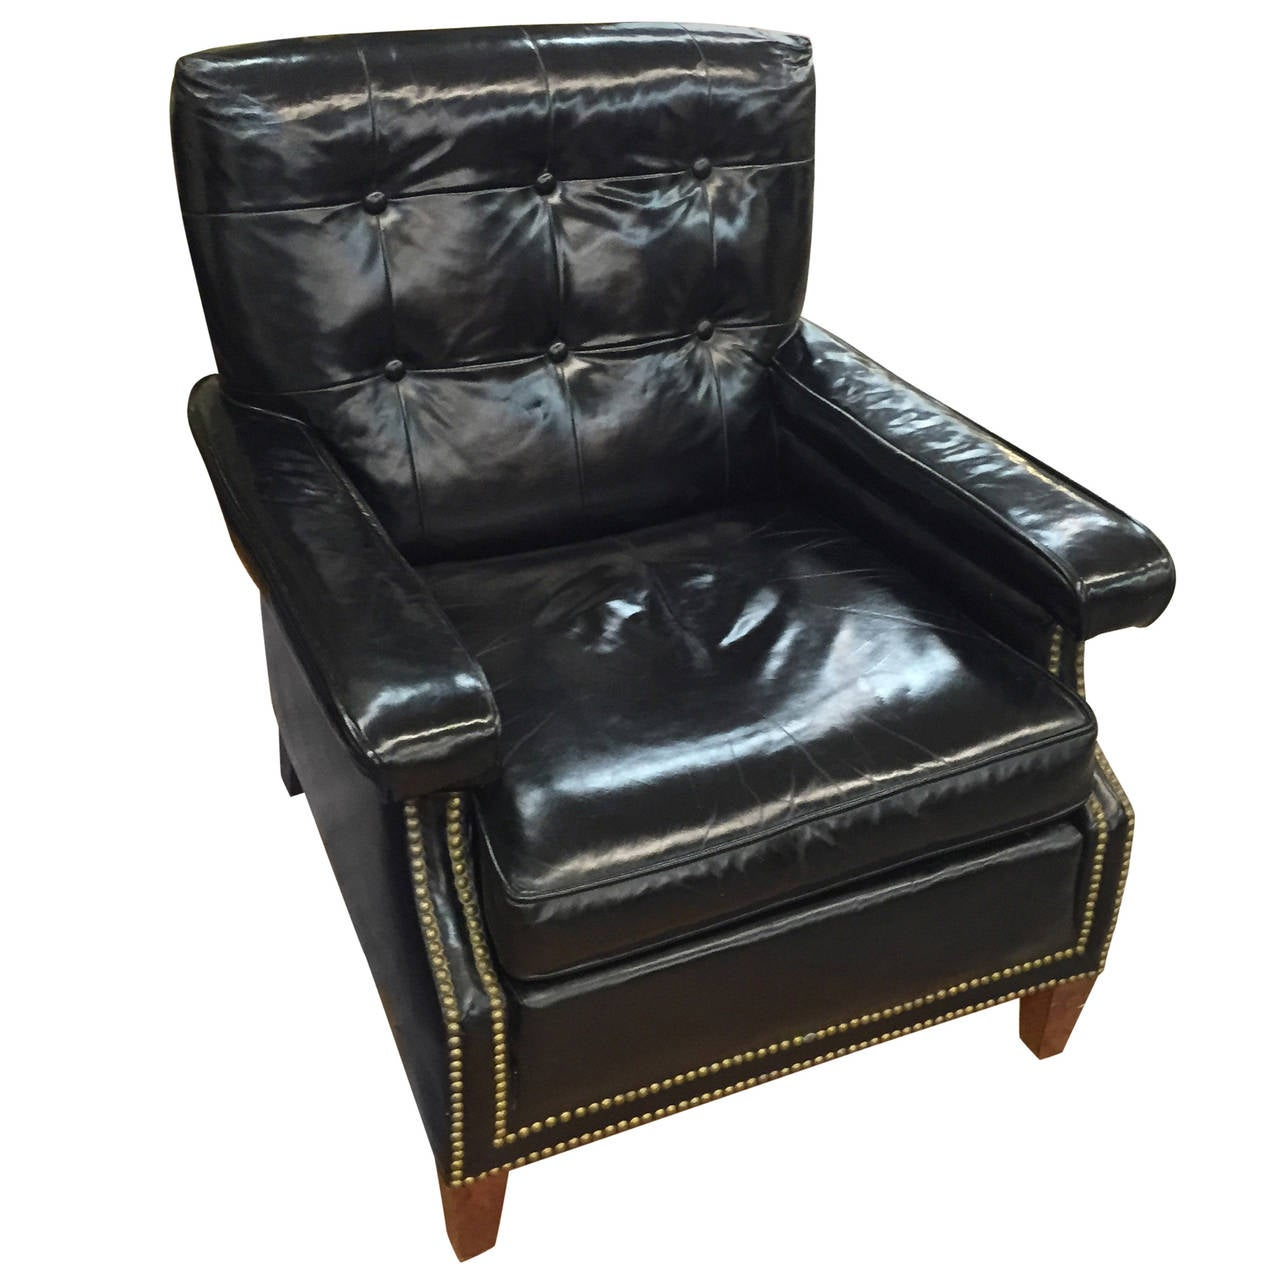 chair design patent dream catcher hammock leather club at 1stdibs